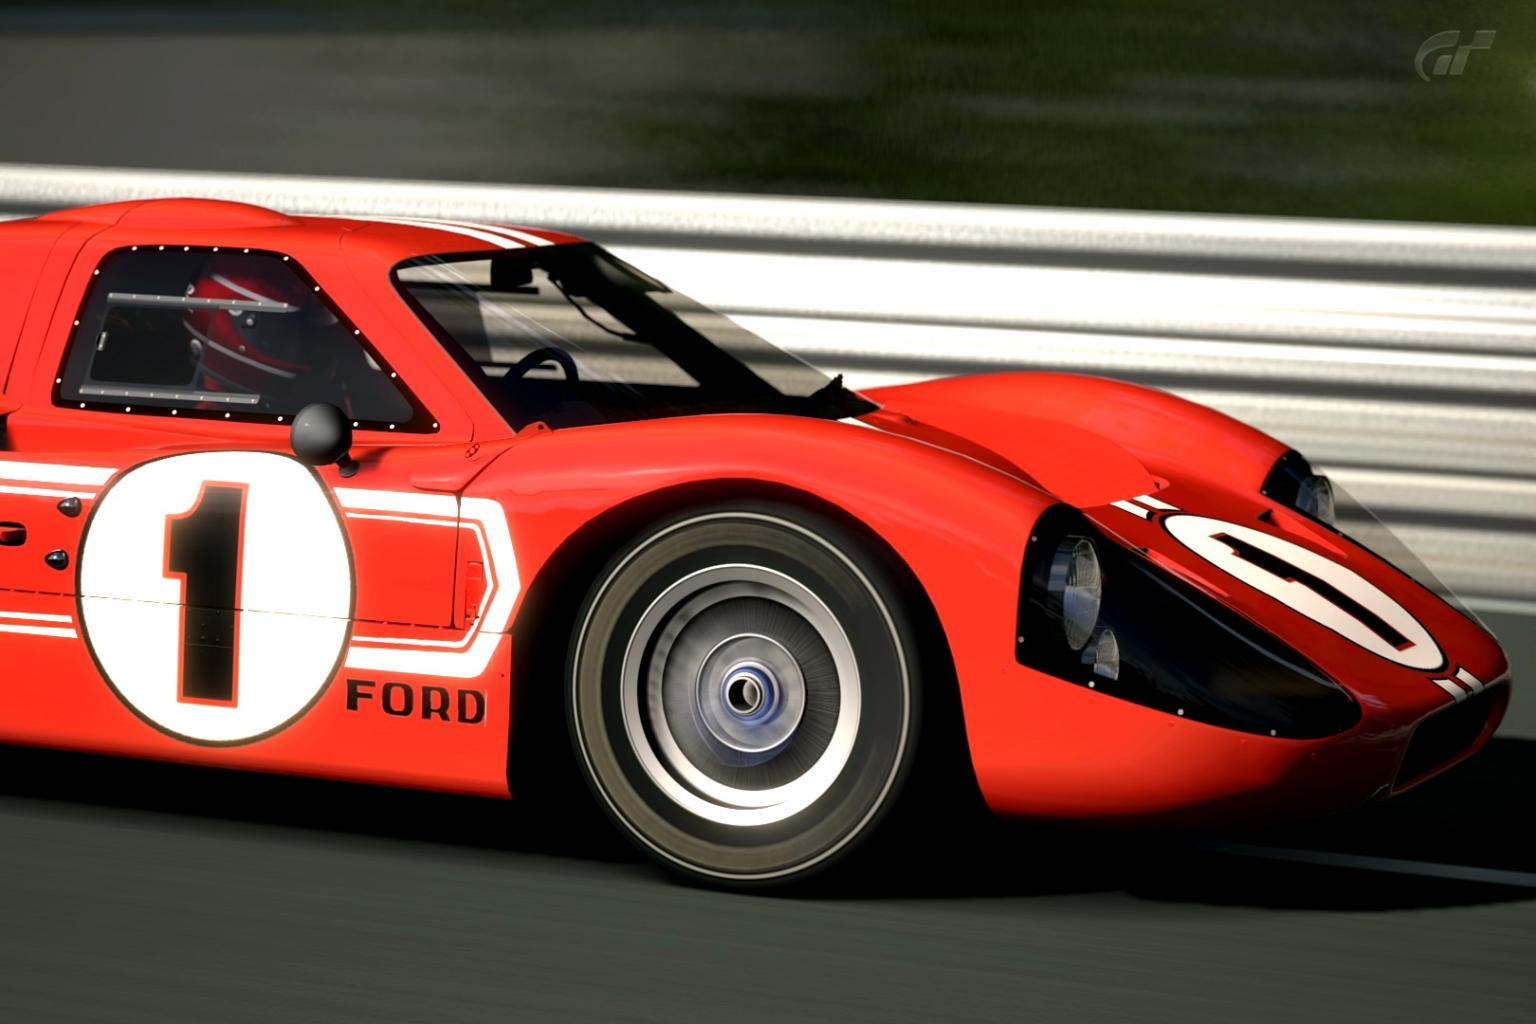 BigB's RCR MKIV-circuit-de-la-sarthe-2005-no-chicanes-_11-jpg